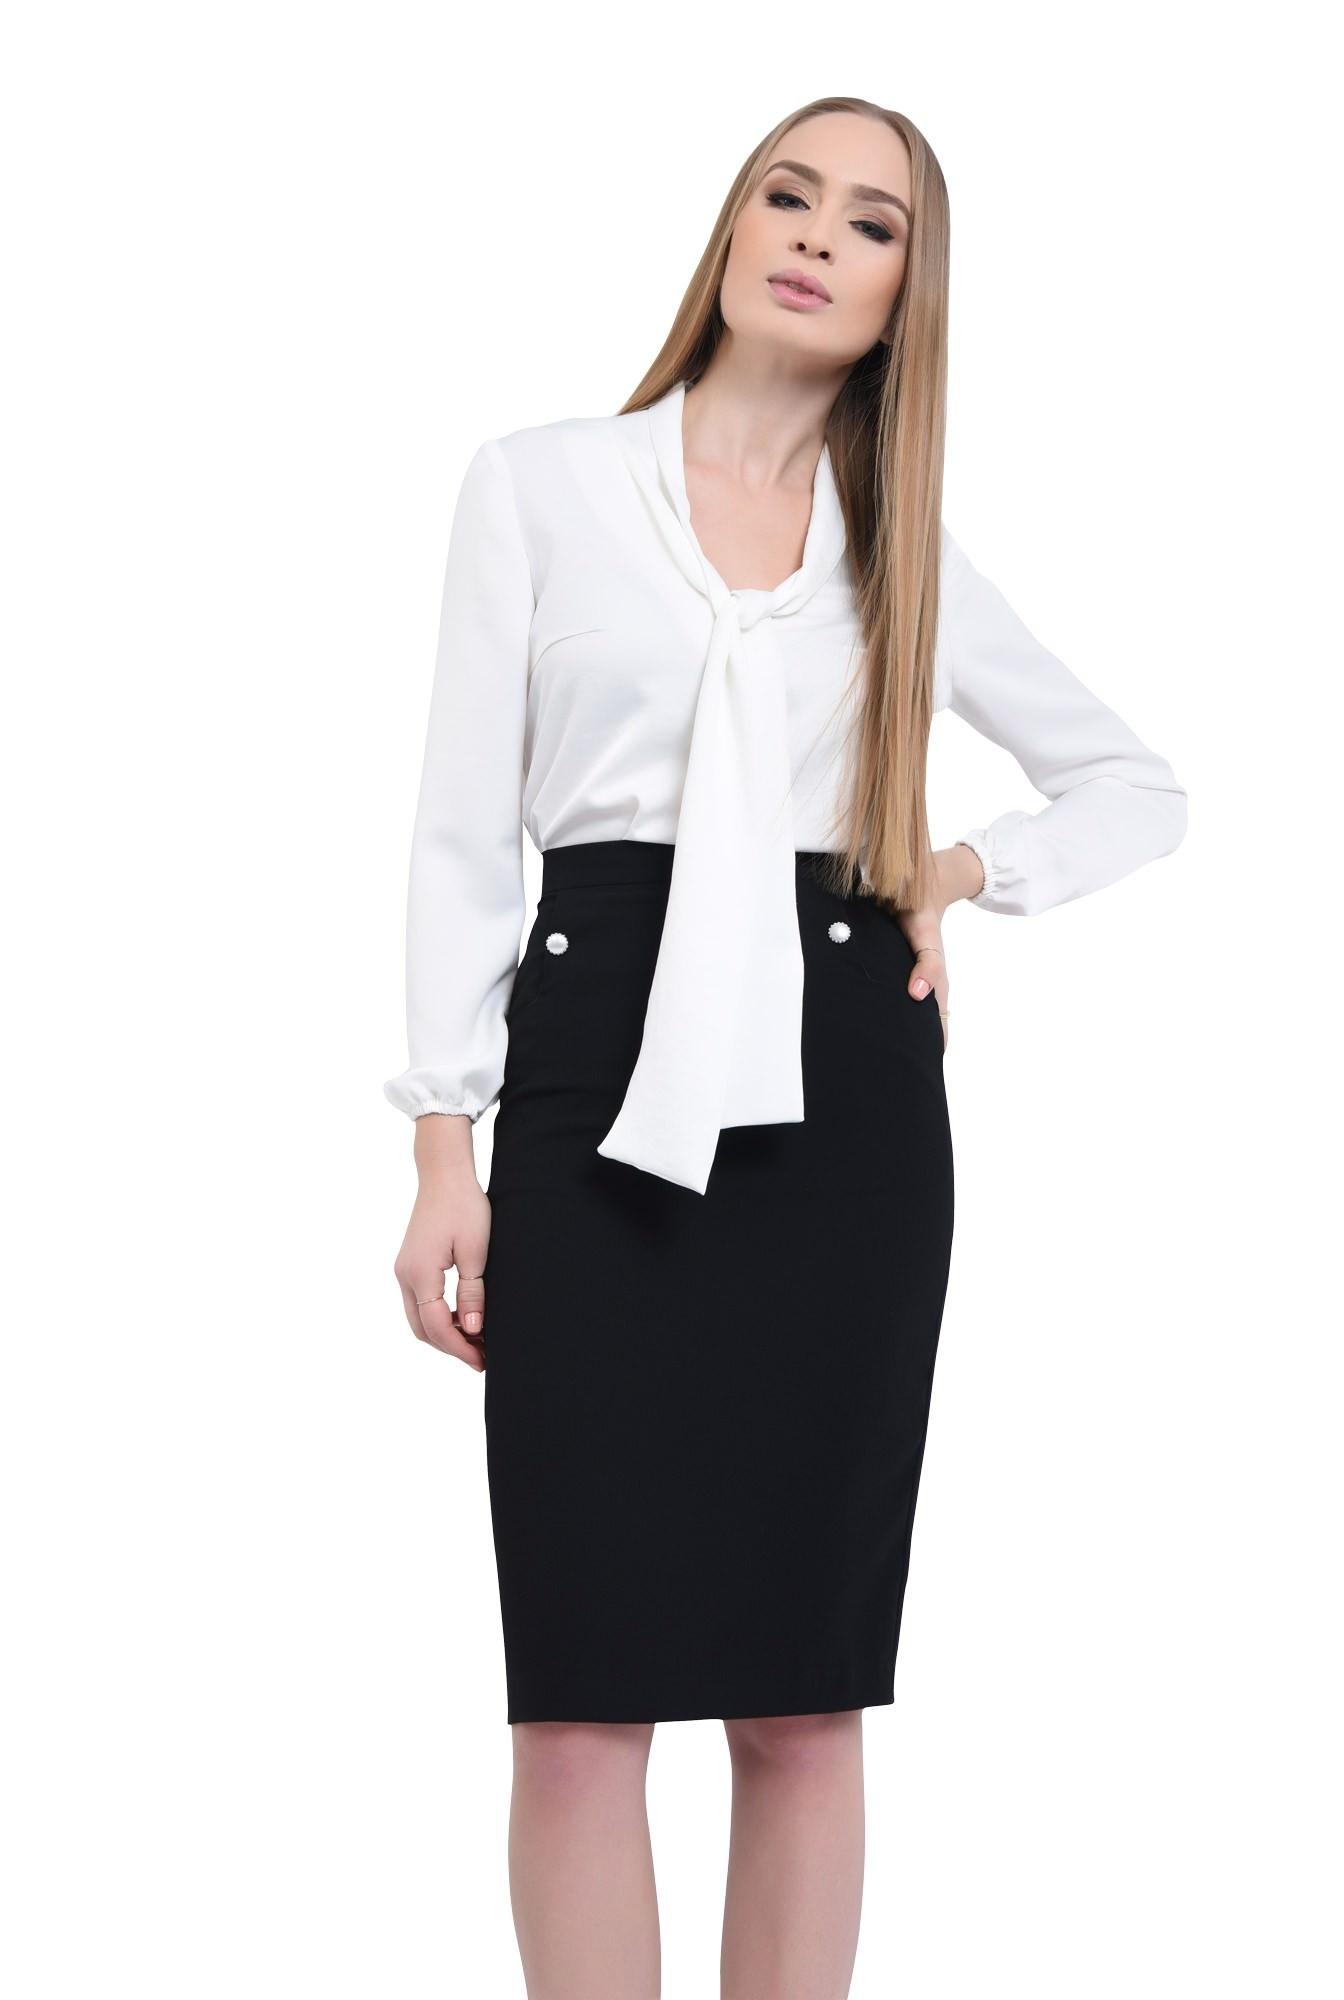 Bluza office, alb, maneci lungi